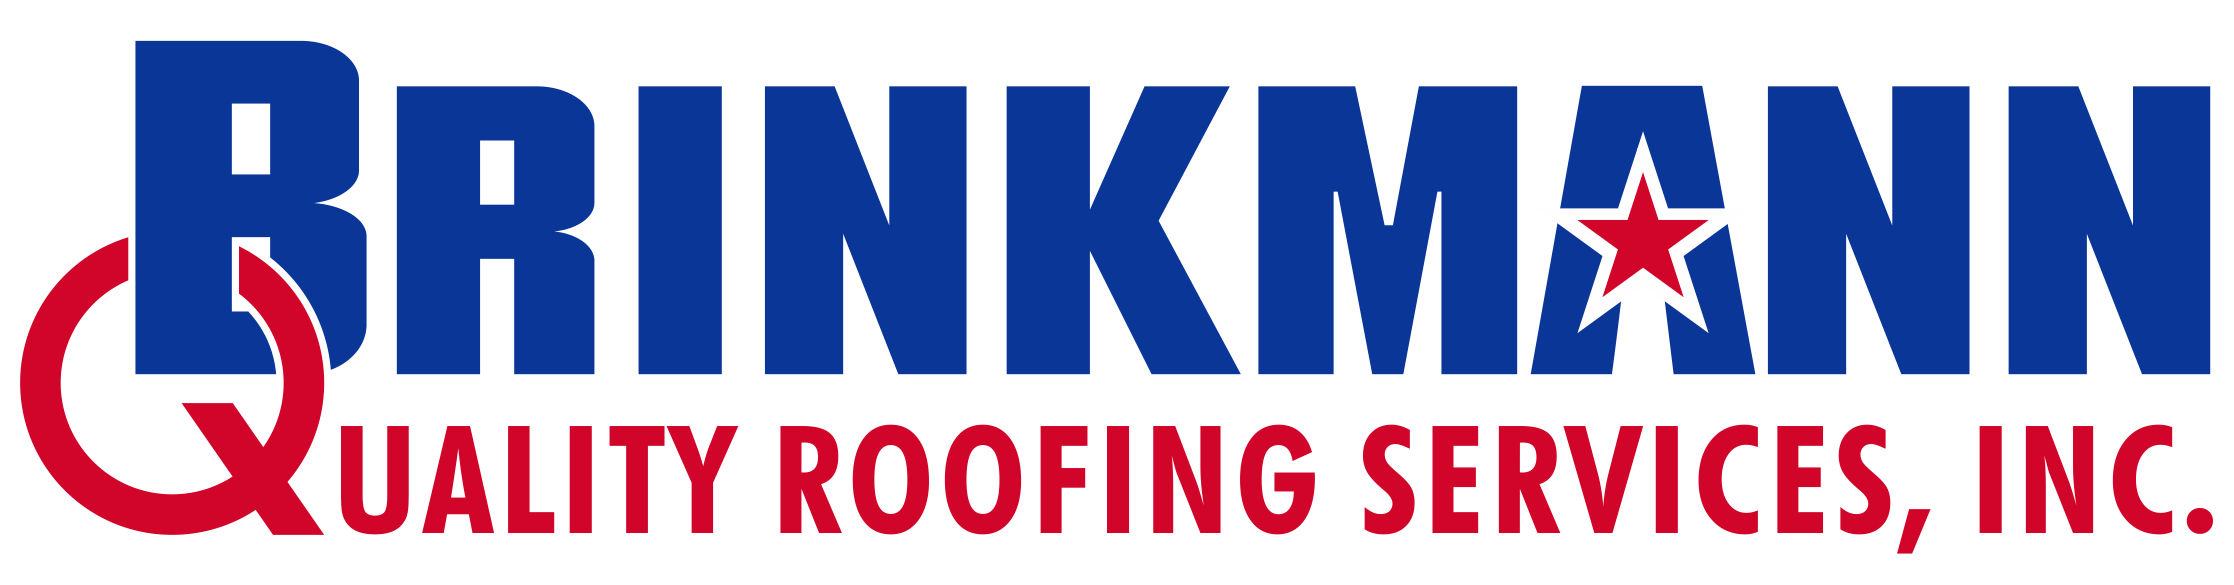 Do you get a wpi 8 certificate brinkmann quality roofing services 1betcityfo Choice Image